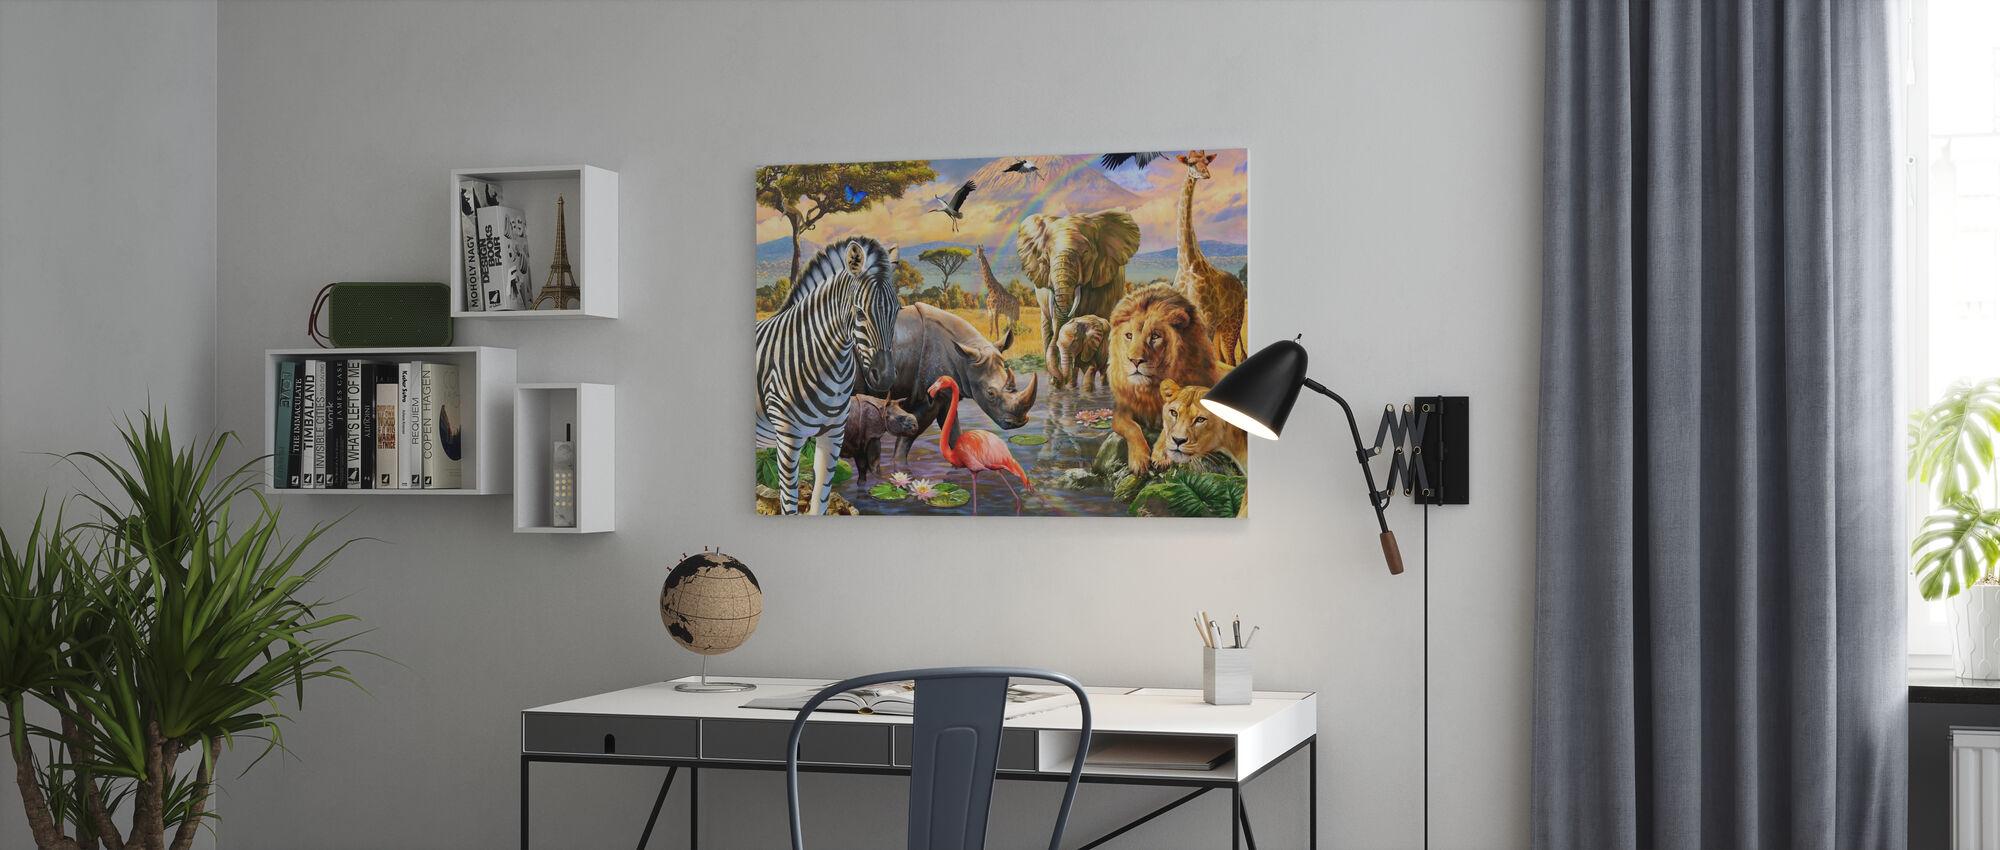 Savanna Watering Hole - Canvas print - Office